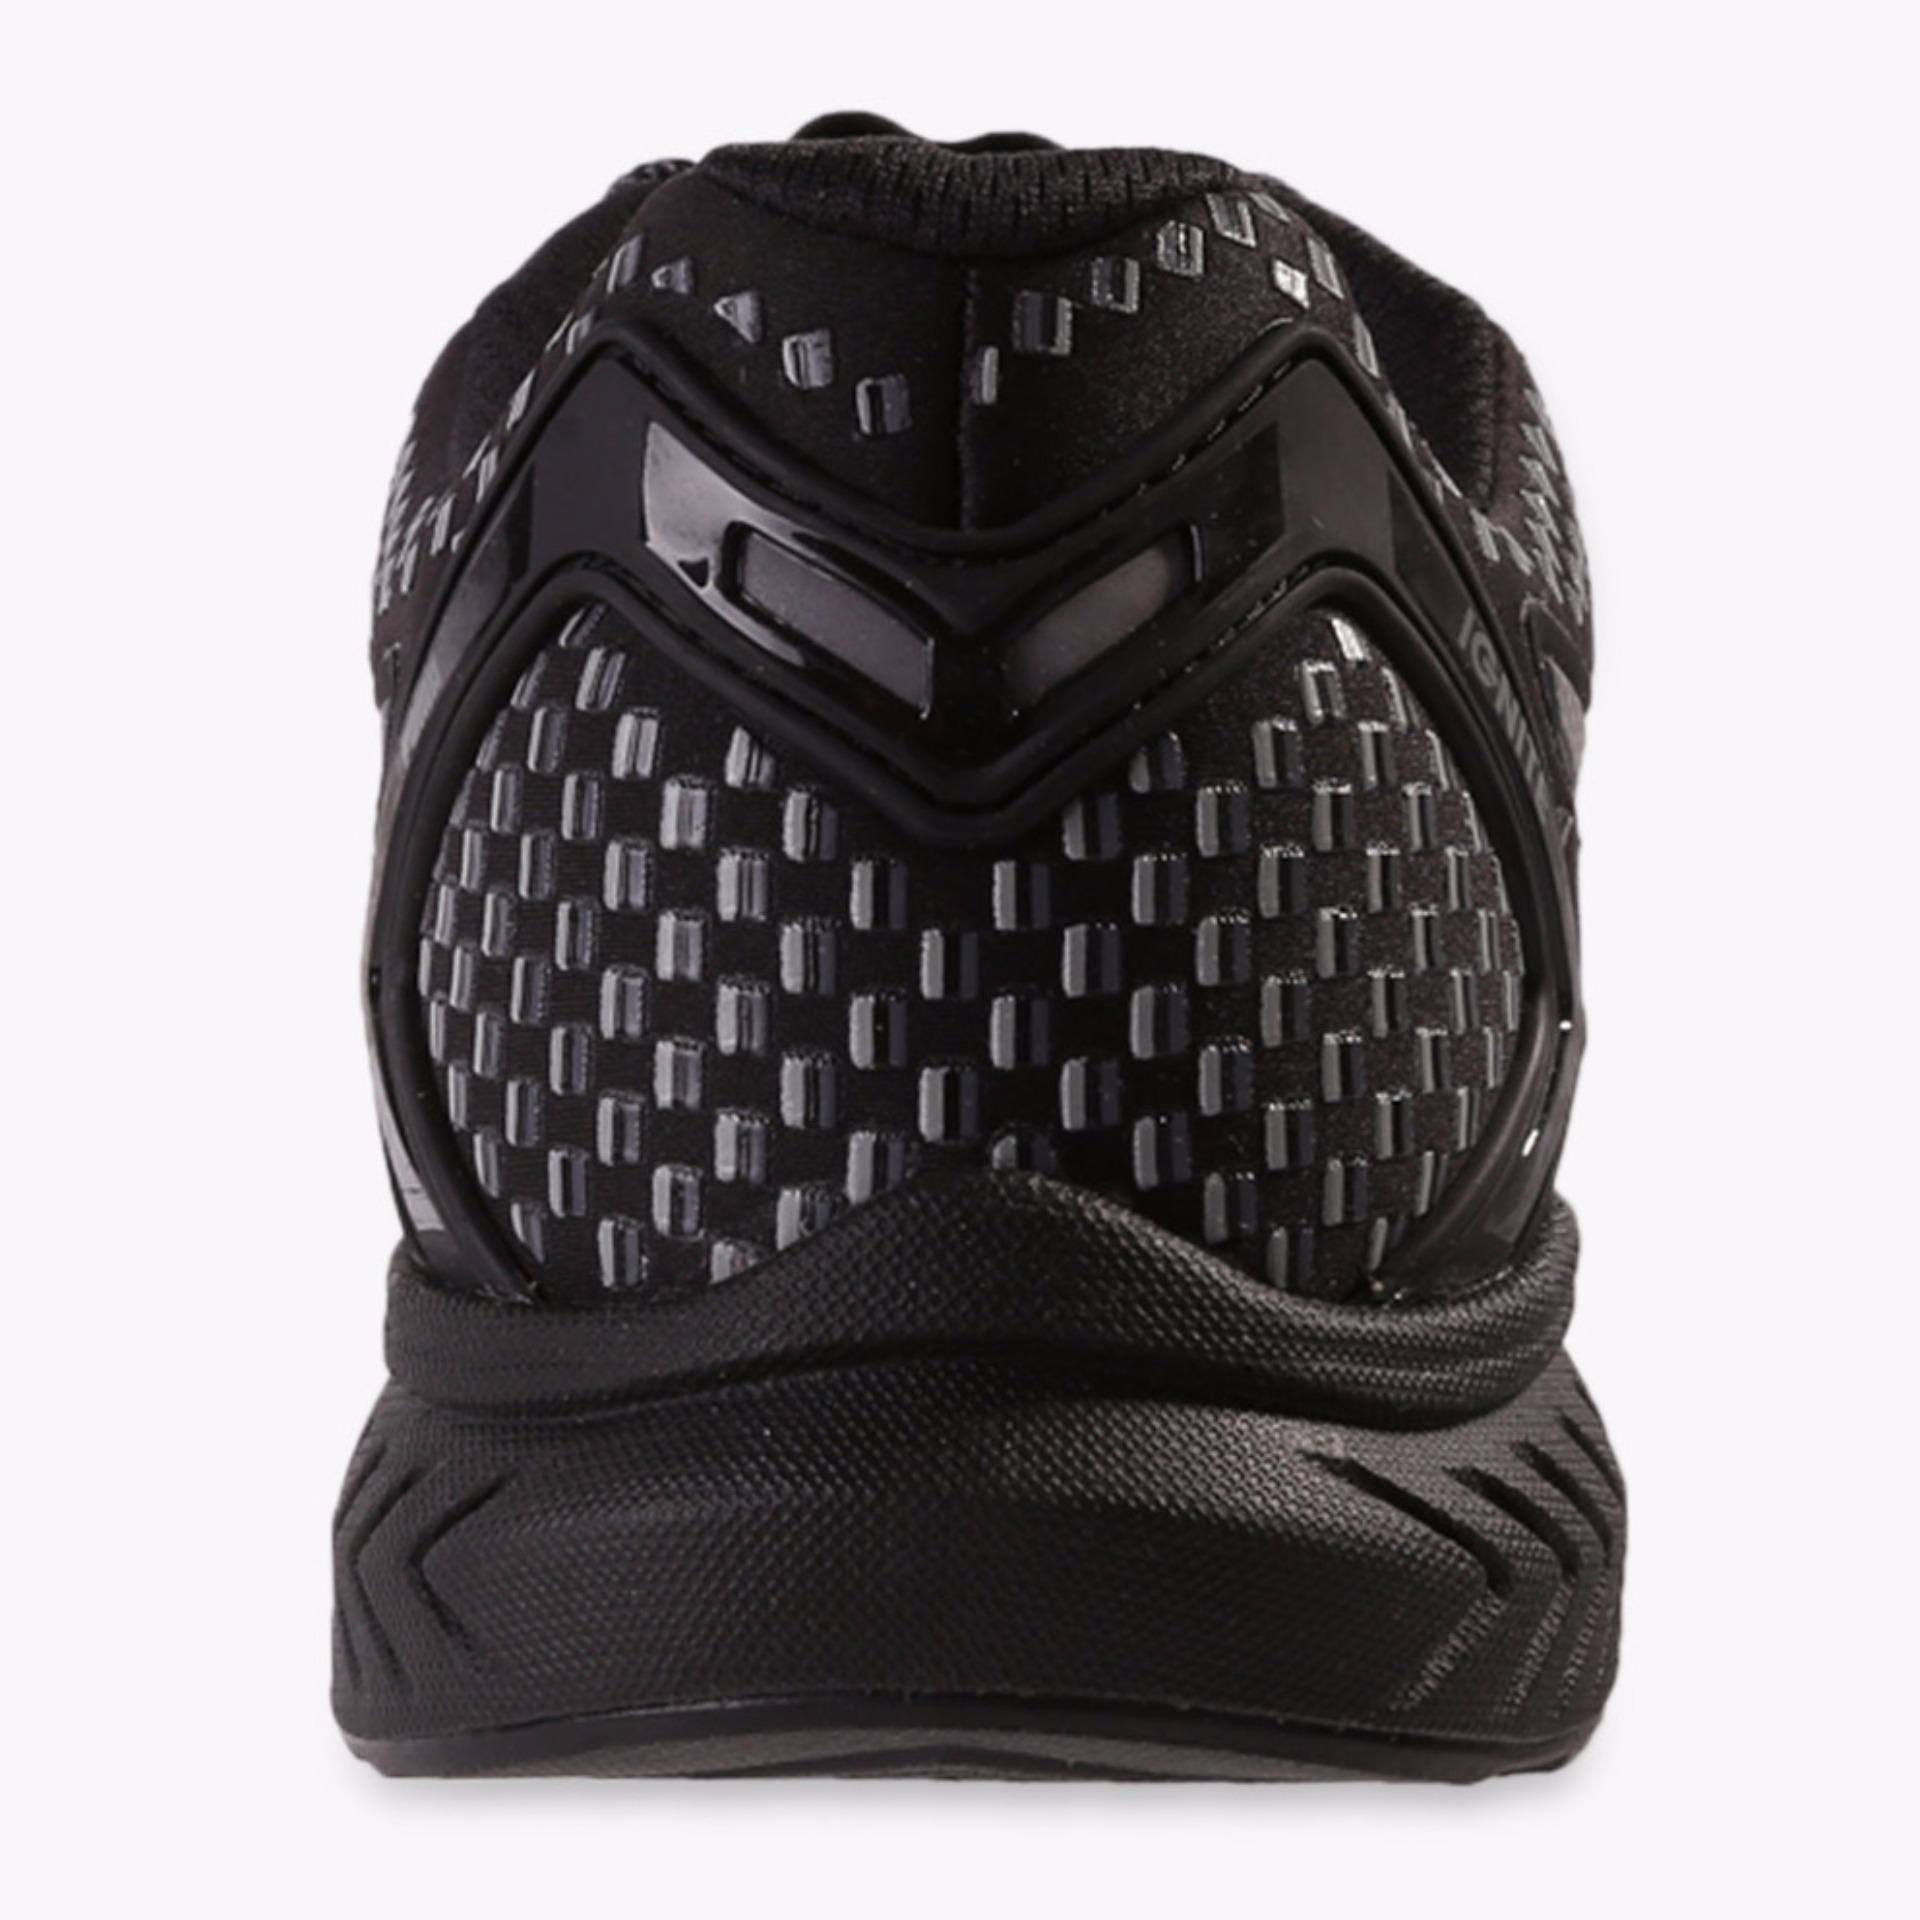 Puma IGNITE Dual Shift Men's Running Shoes - Hitam .